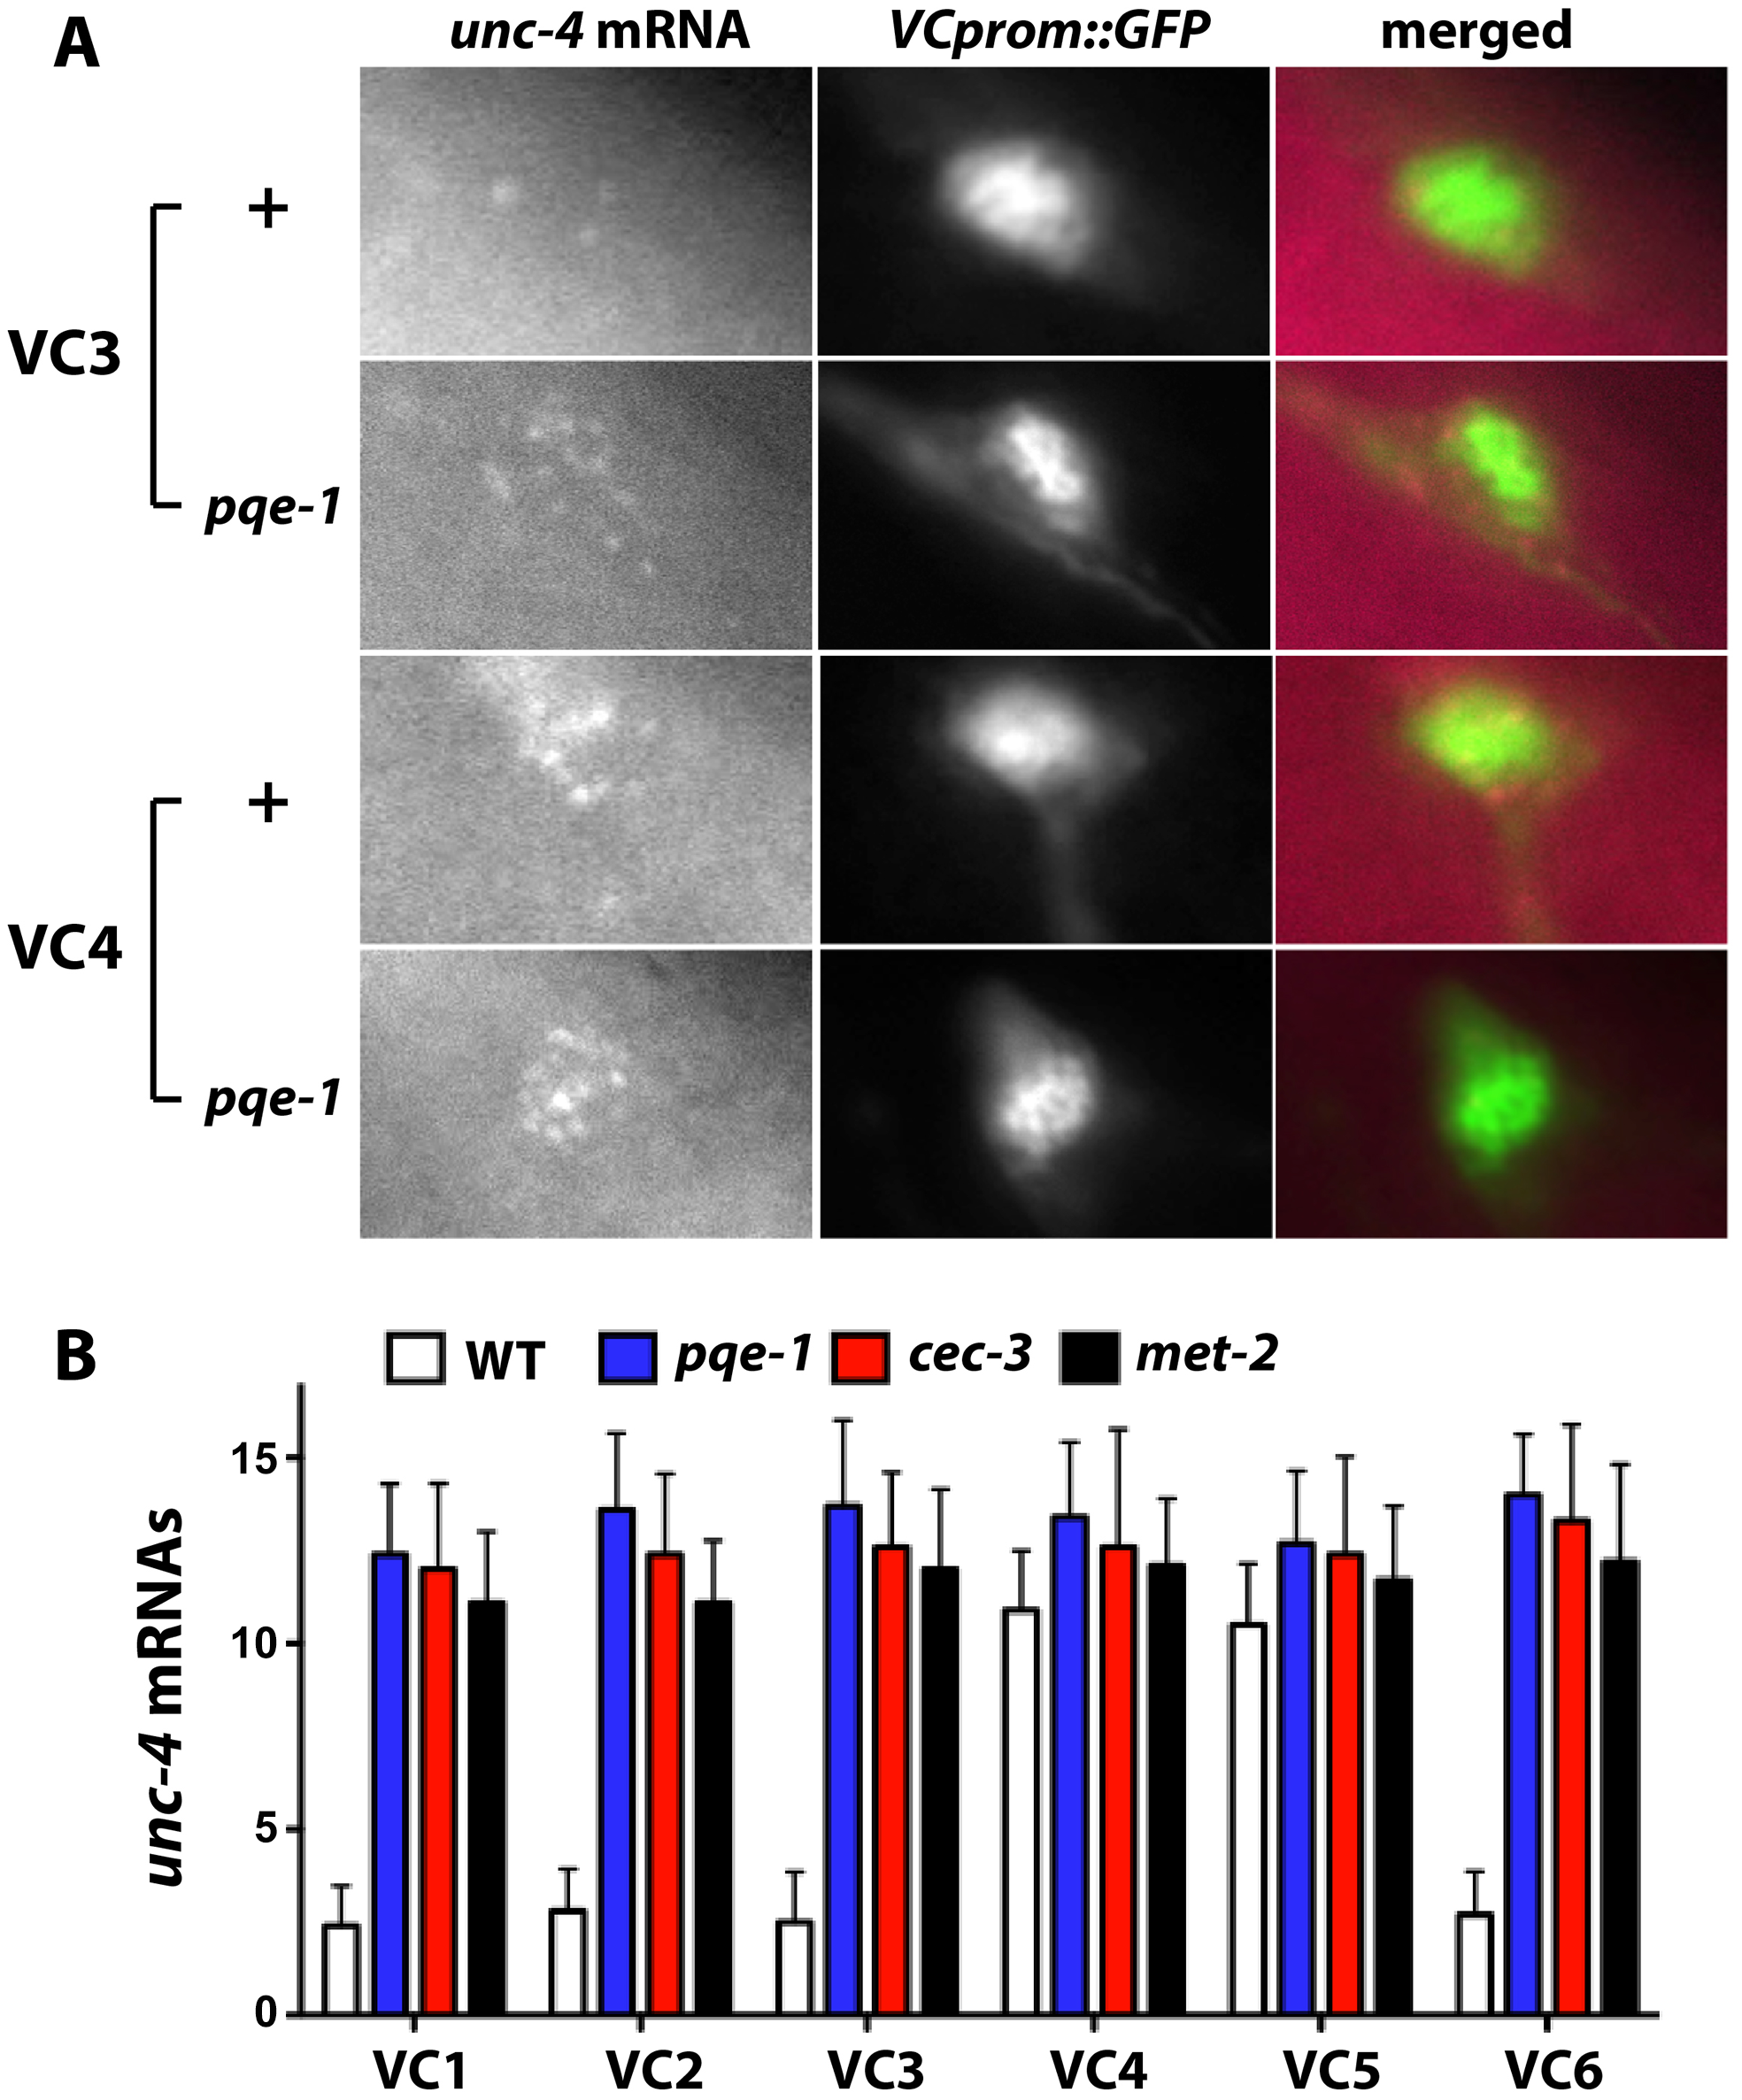 Endogenous <i>unc-4</i> transcripts accumulate in all six VC neurons in <i>pqe-1</i>, <i>cec-3</i>, and <i>met-2</i> mutants.